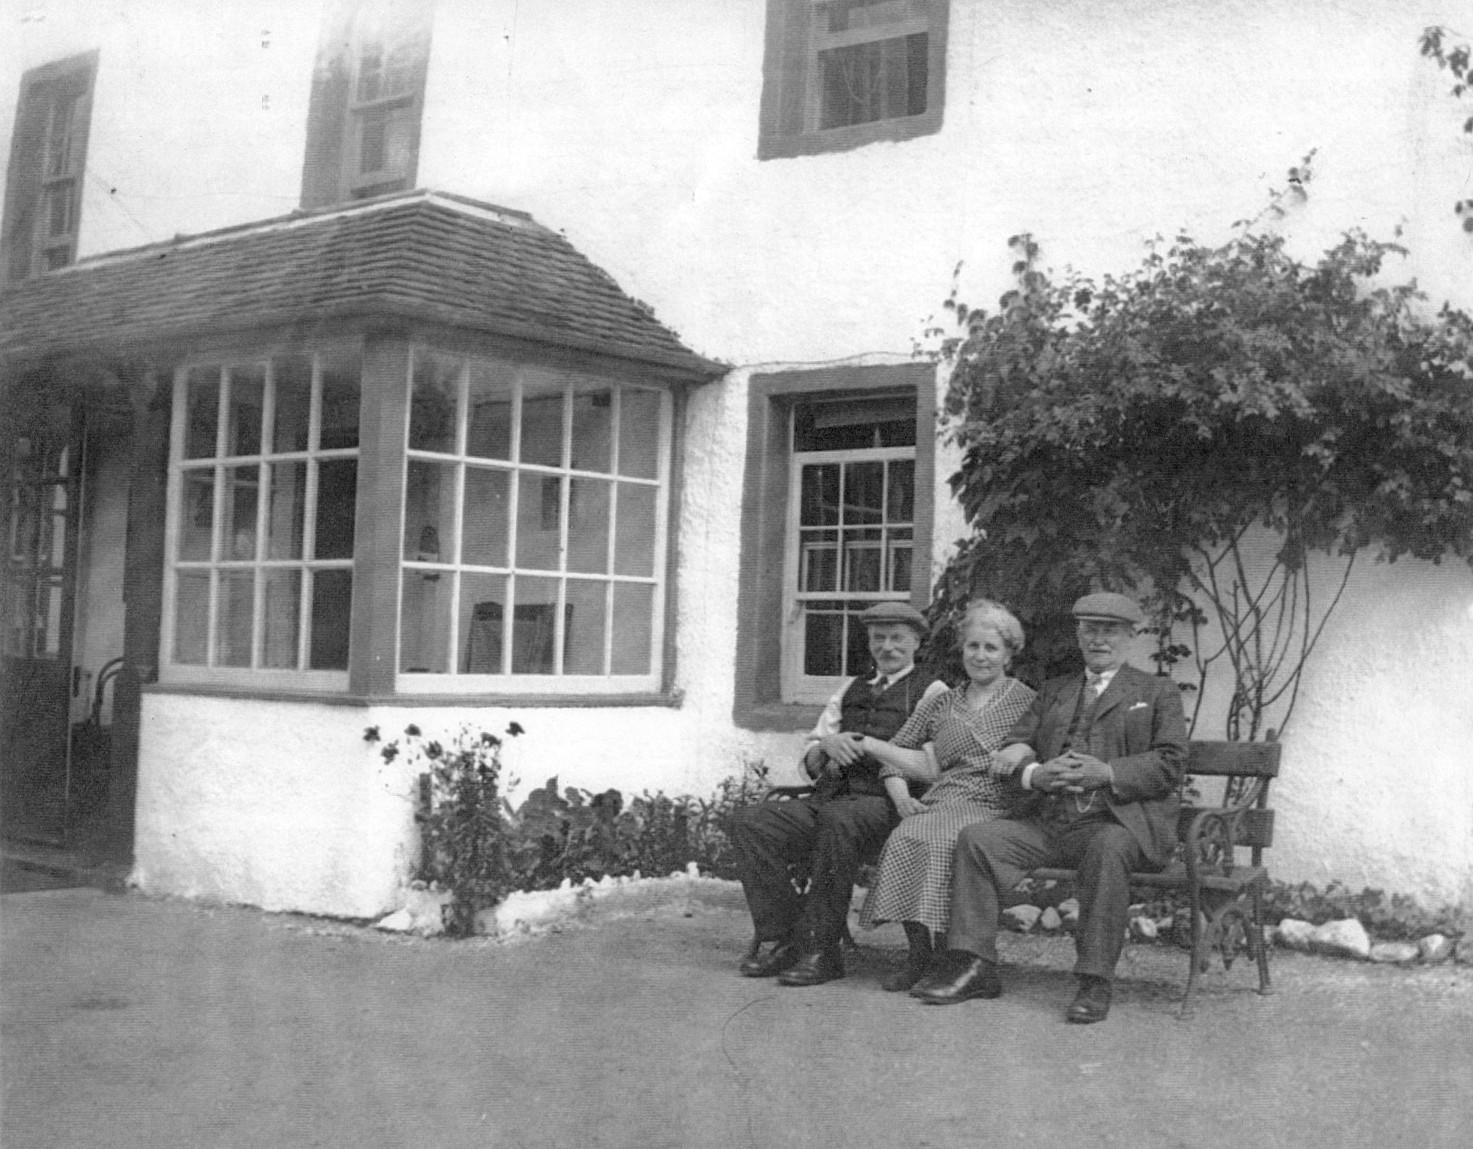 Tommy & Mrs Jones